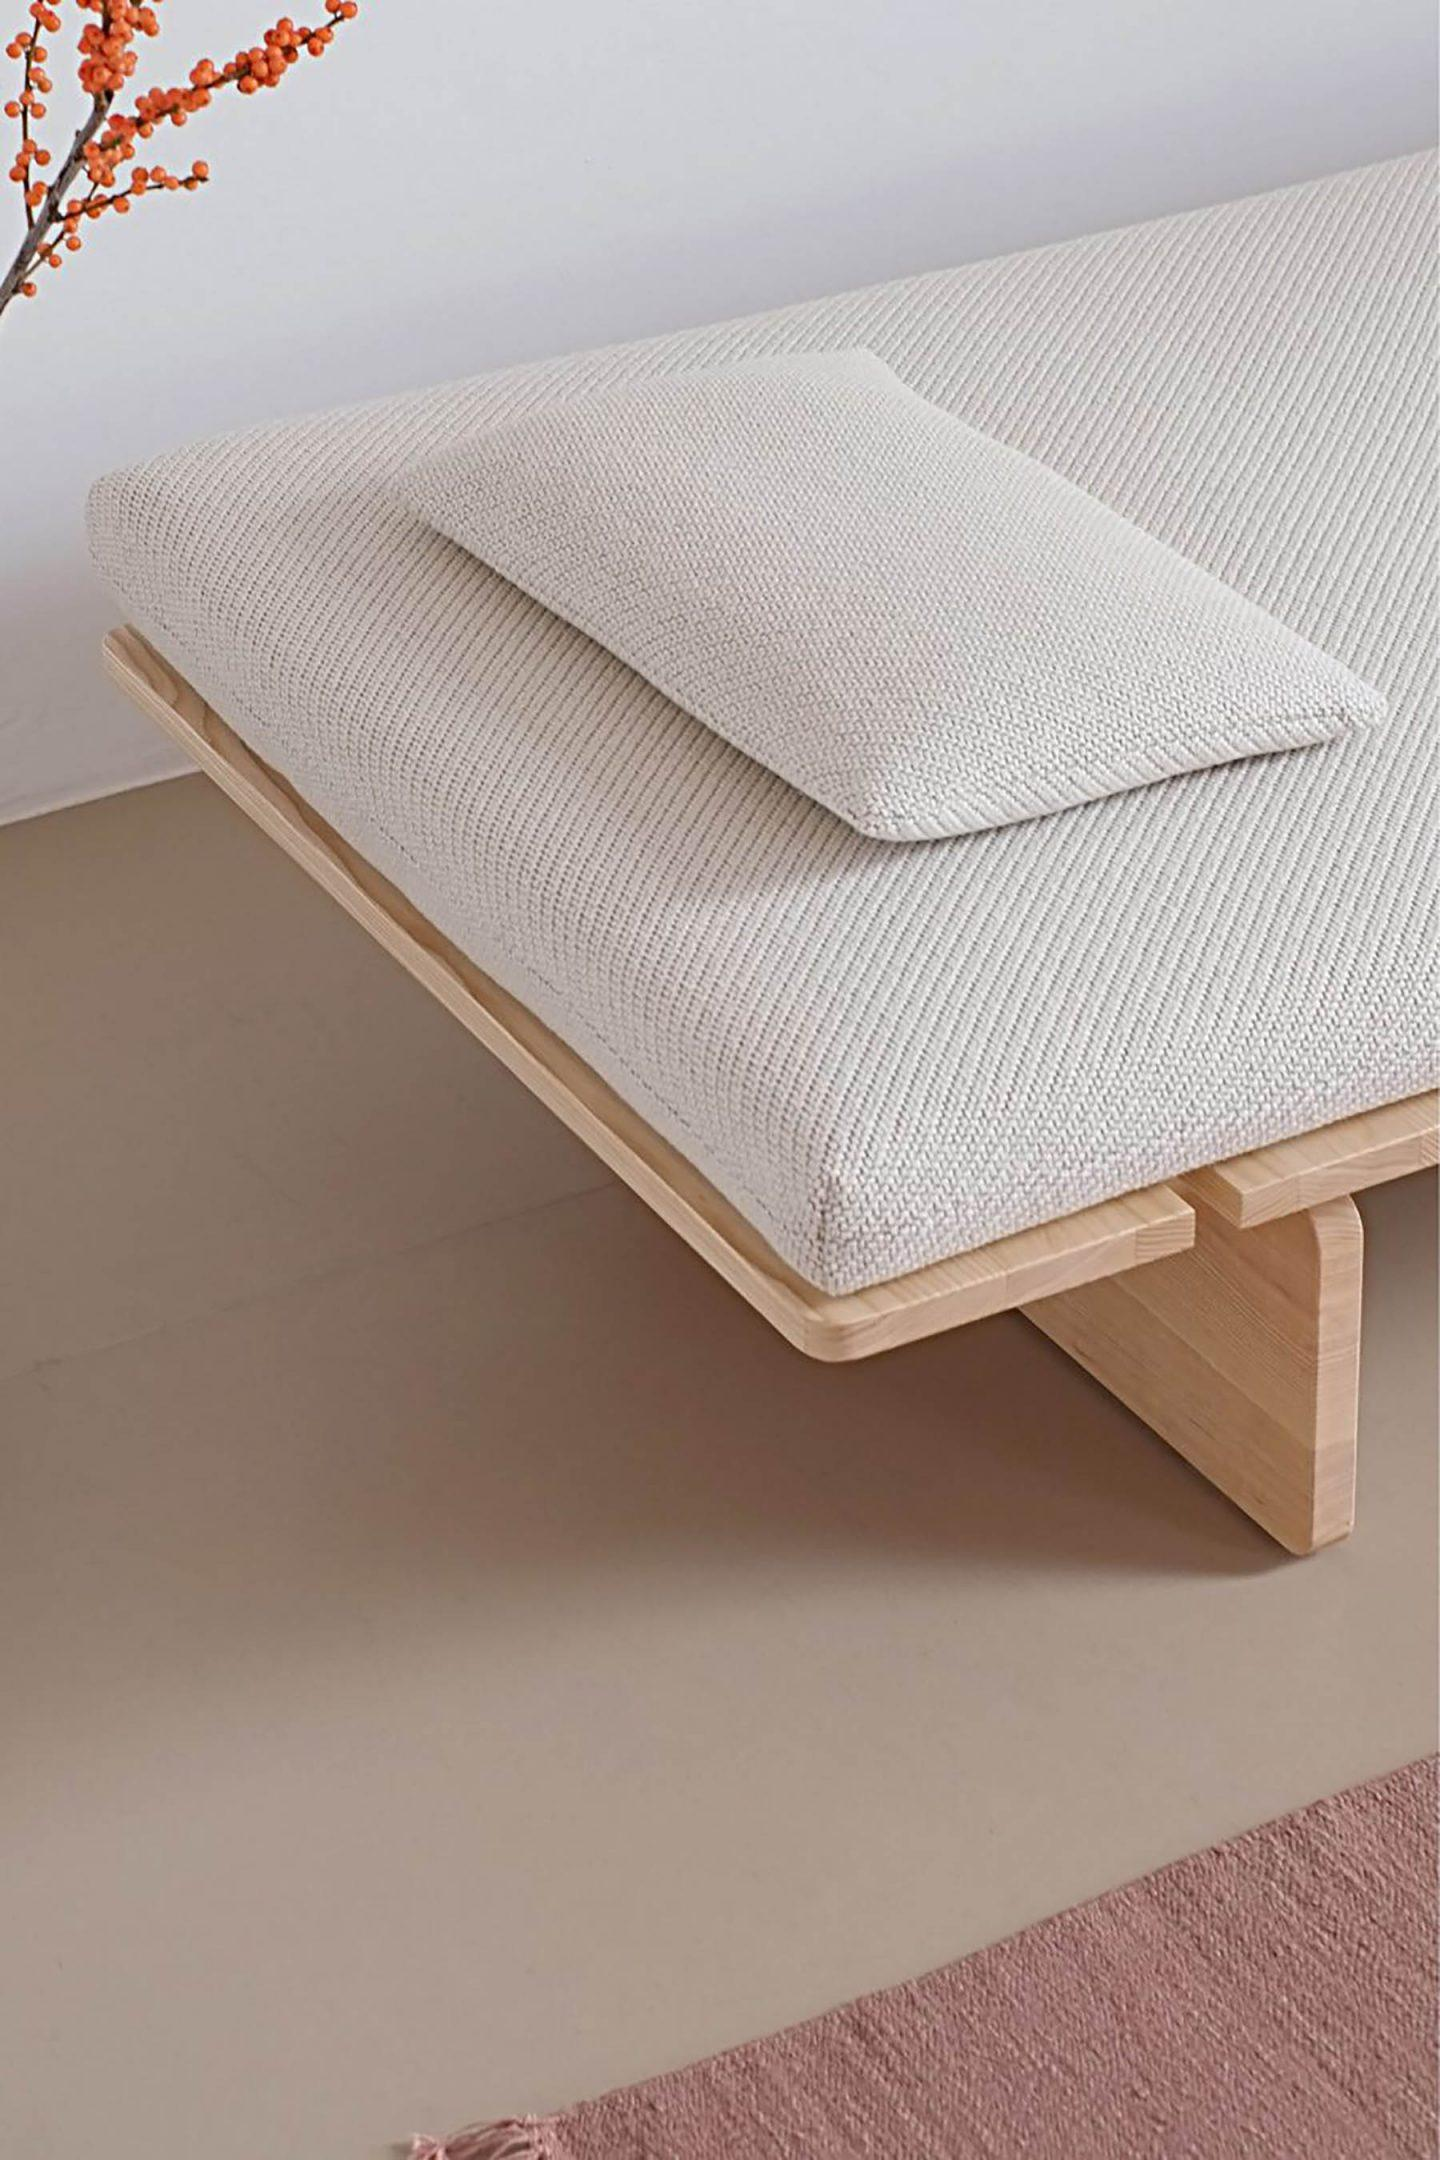 IGNANT-Design-Johannes-Fuchs-Barril-4